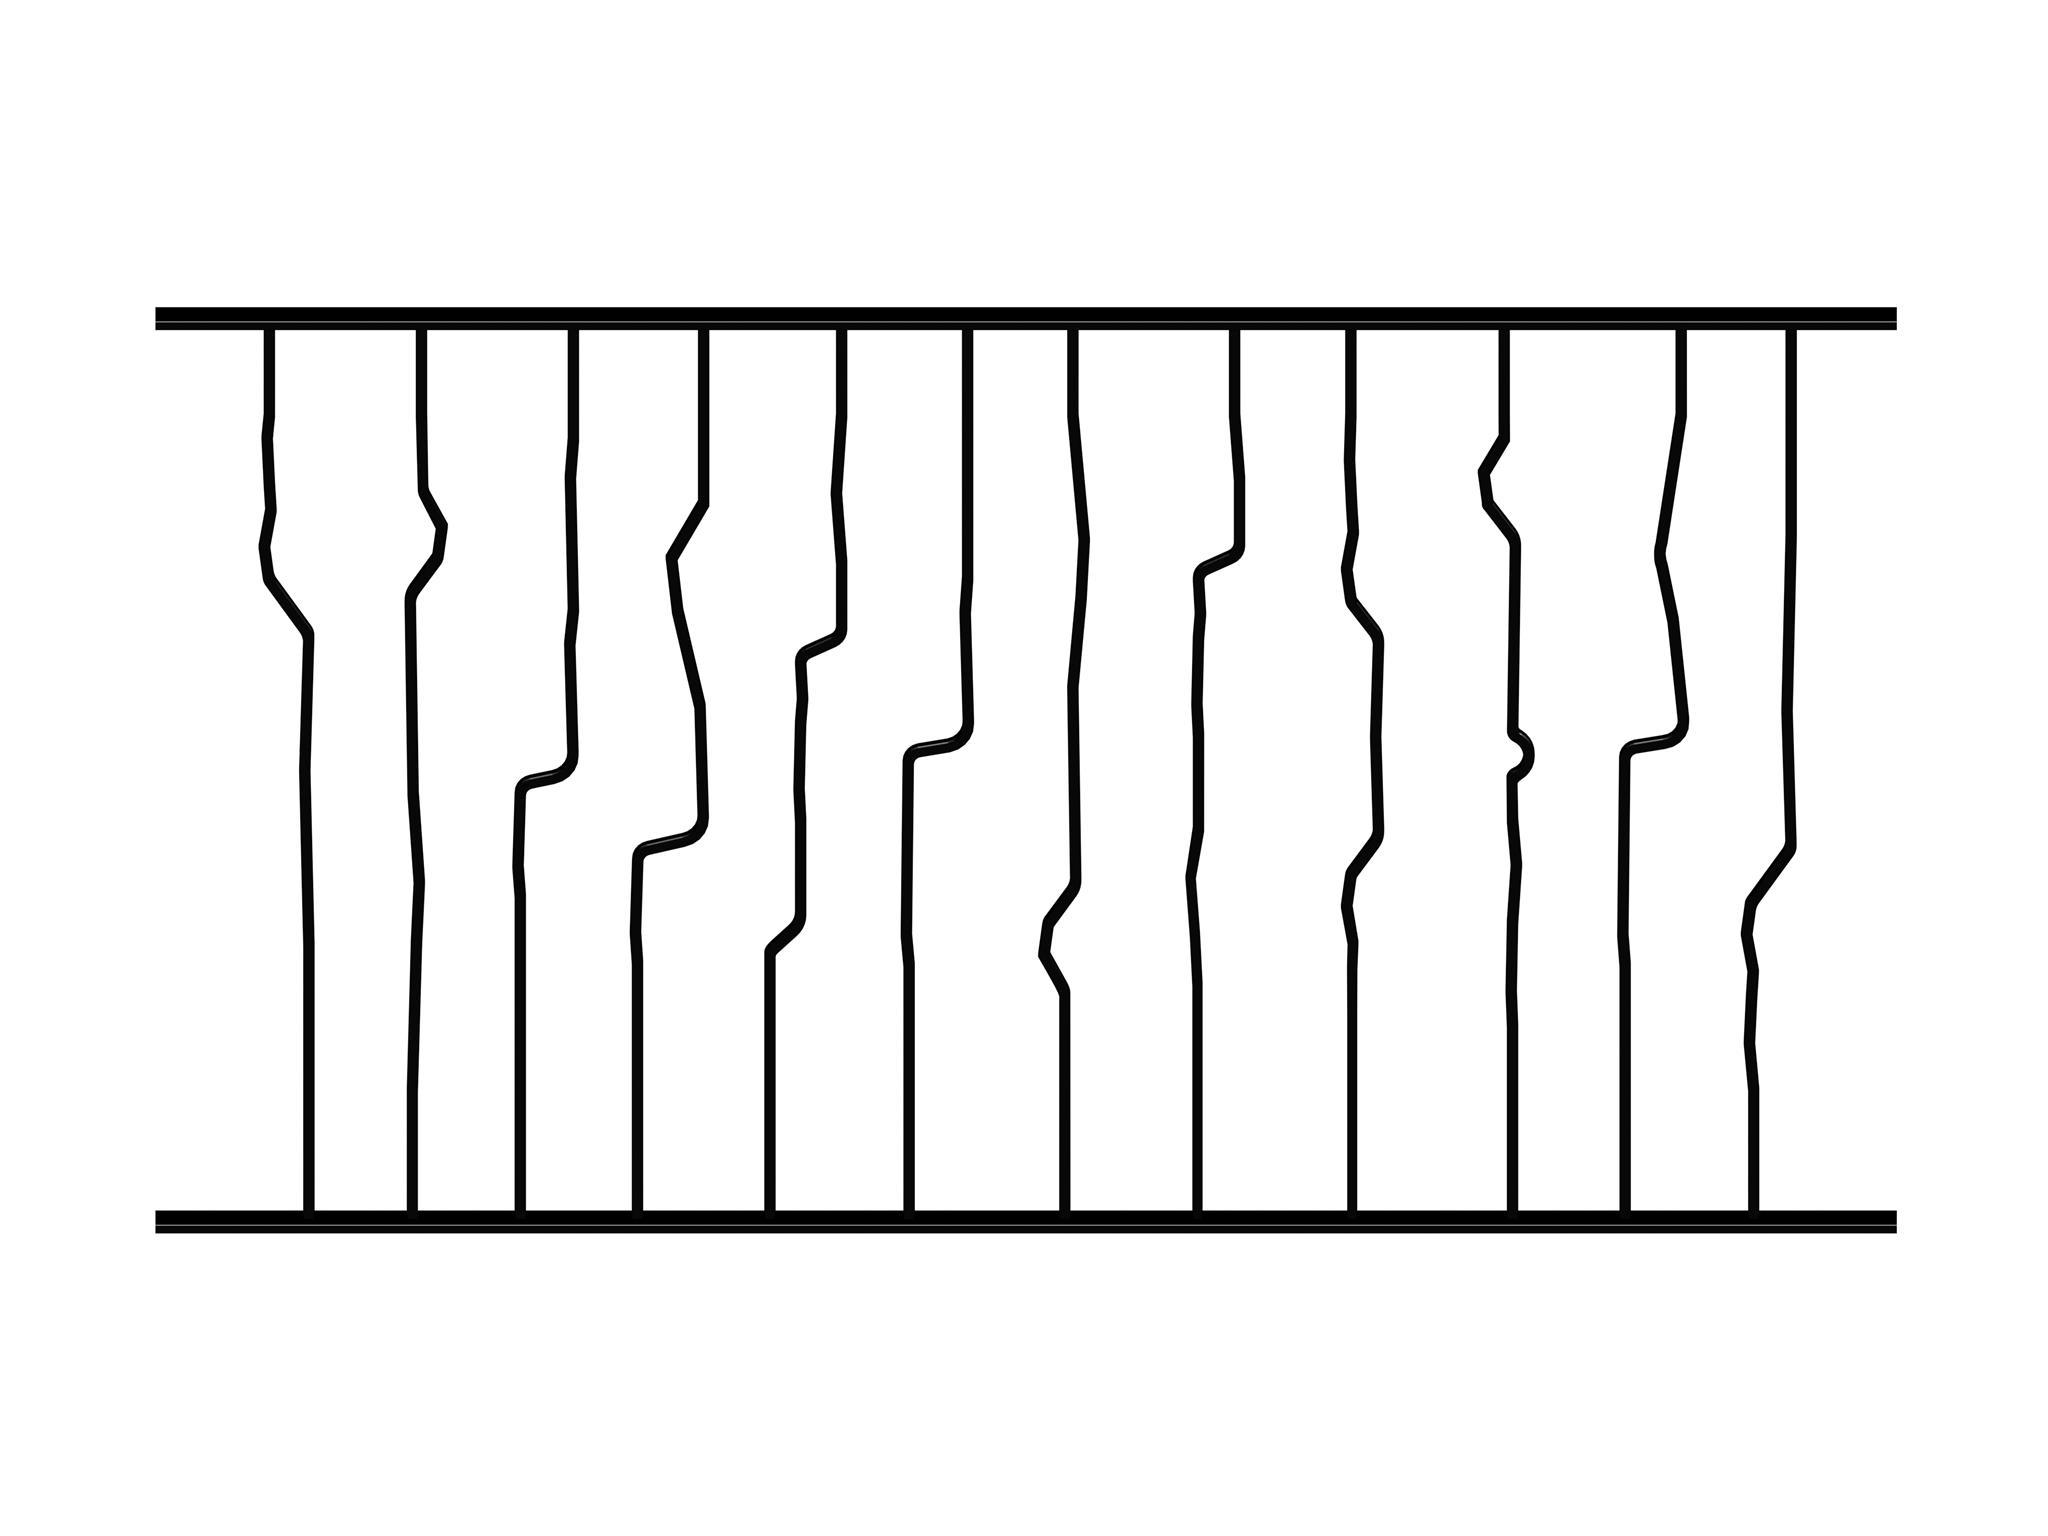 Panneau design carre 1000X1000